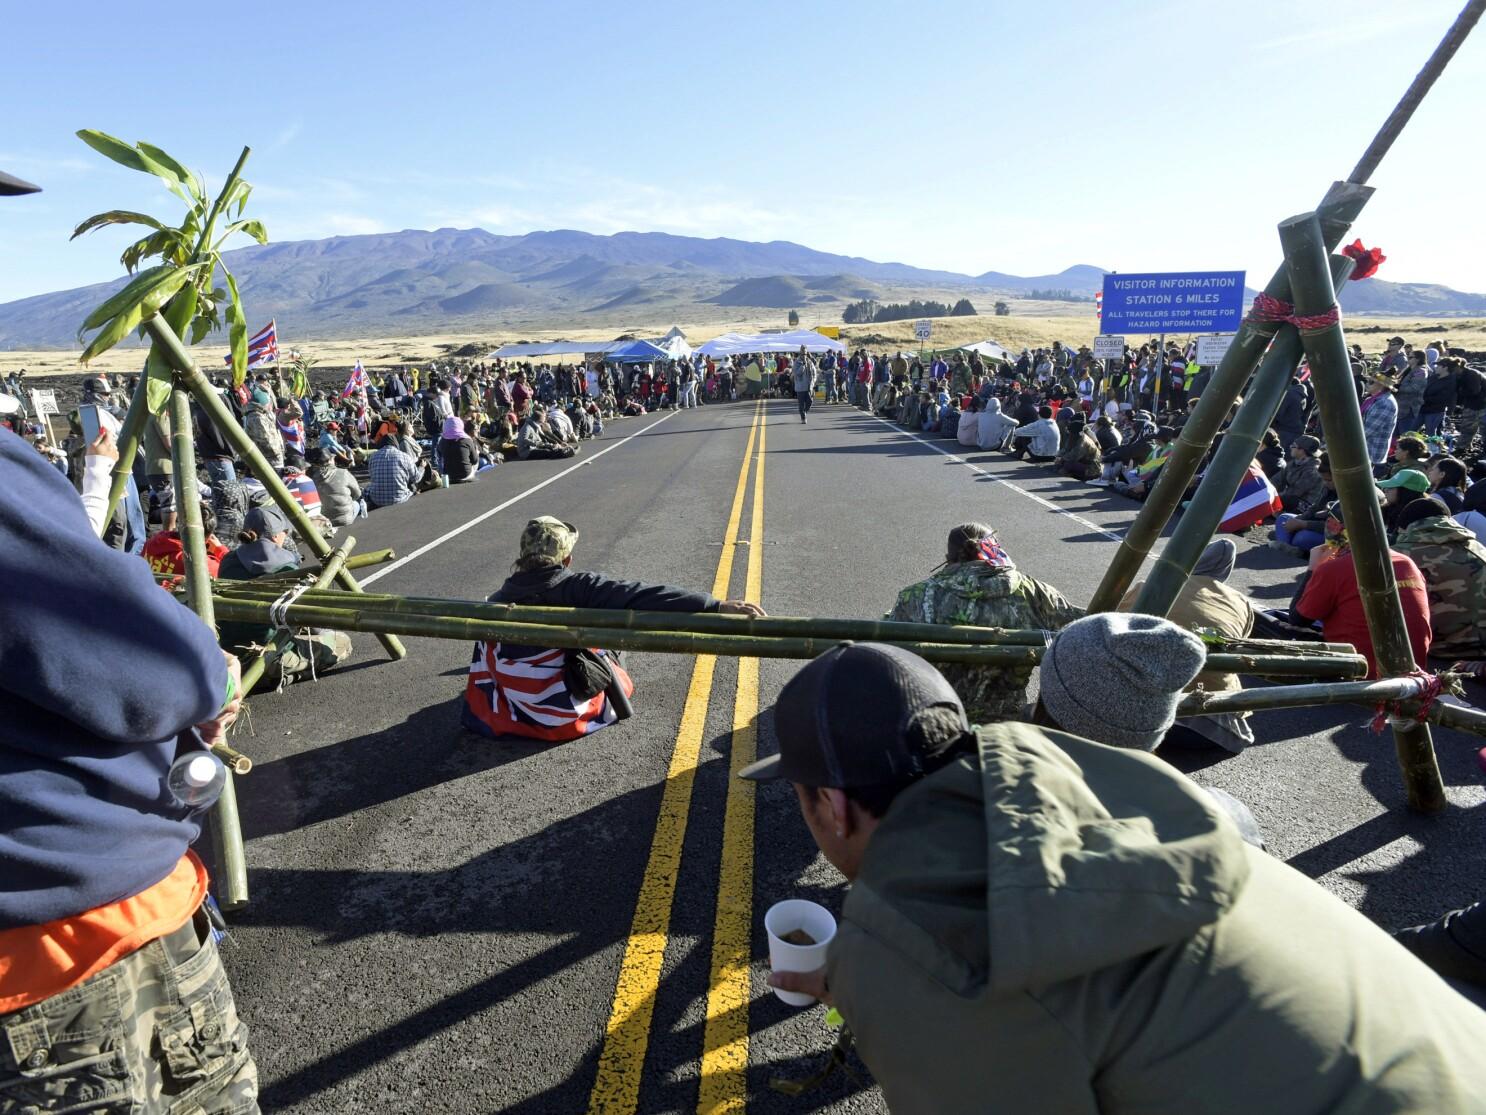 Native Hawaiians protest plans for a massive telescope